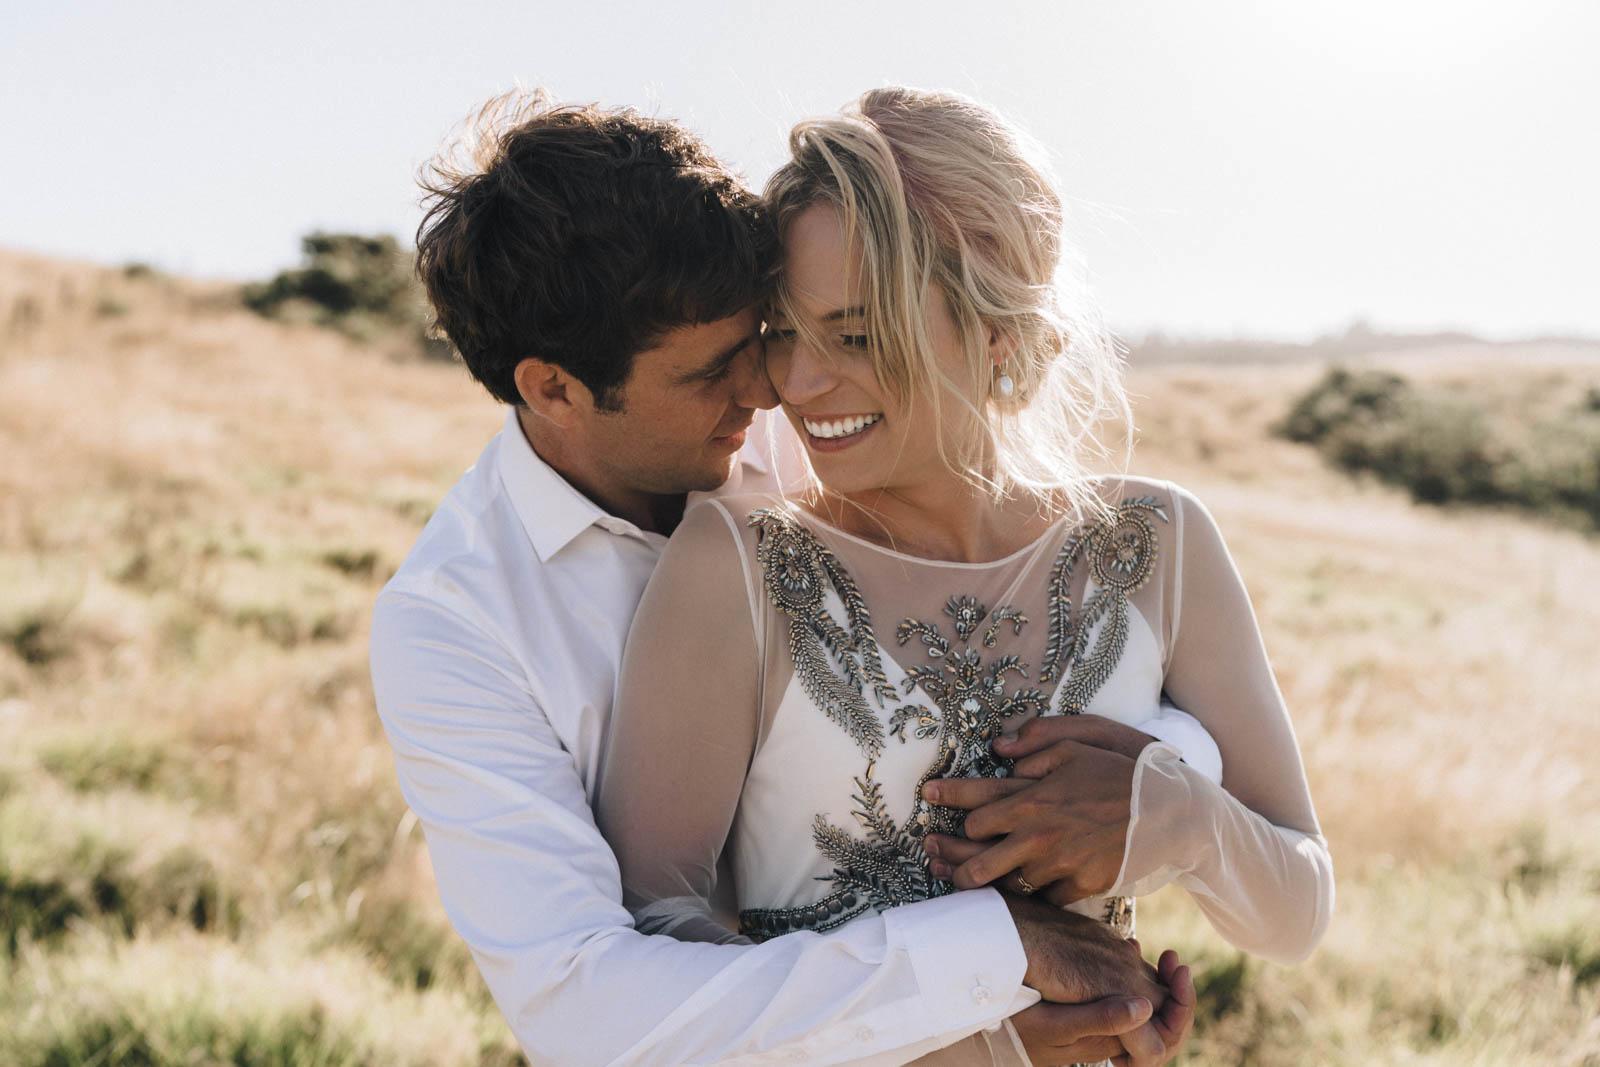 newfound-l-i-coromandel-wedding-photographer-1812-A9_04514